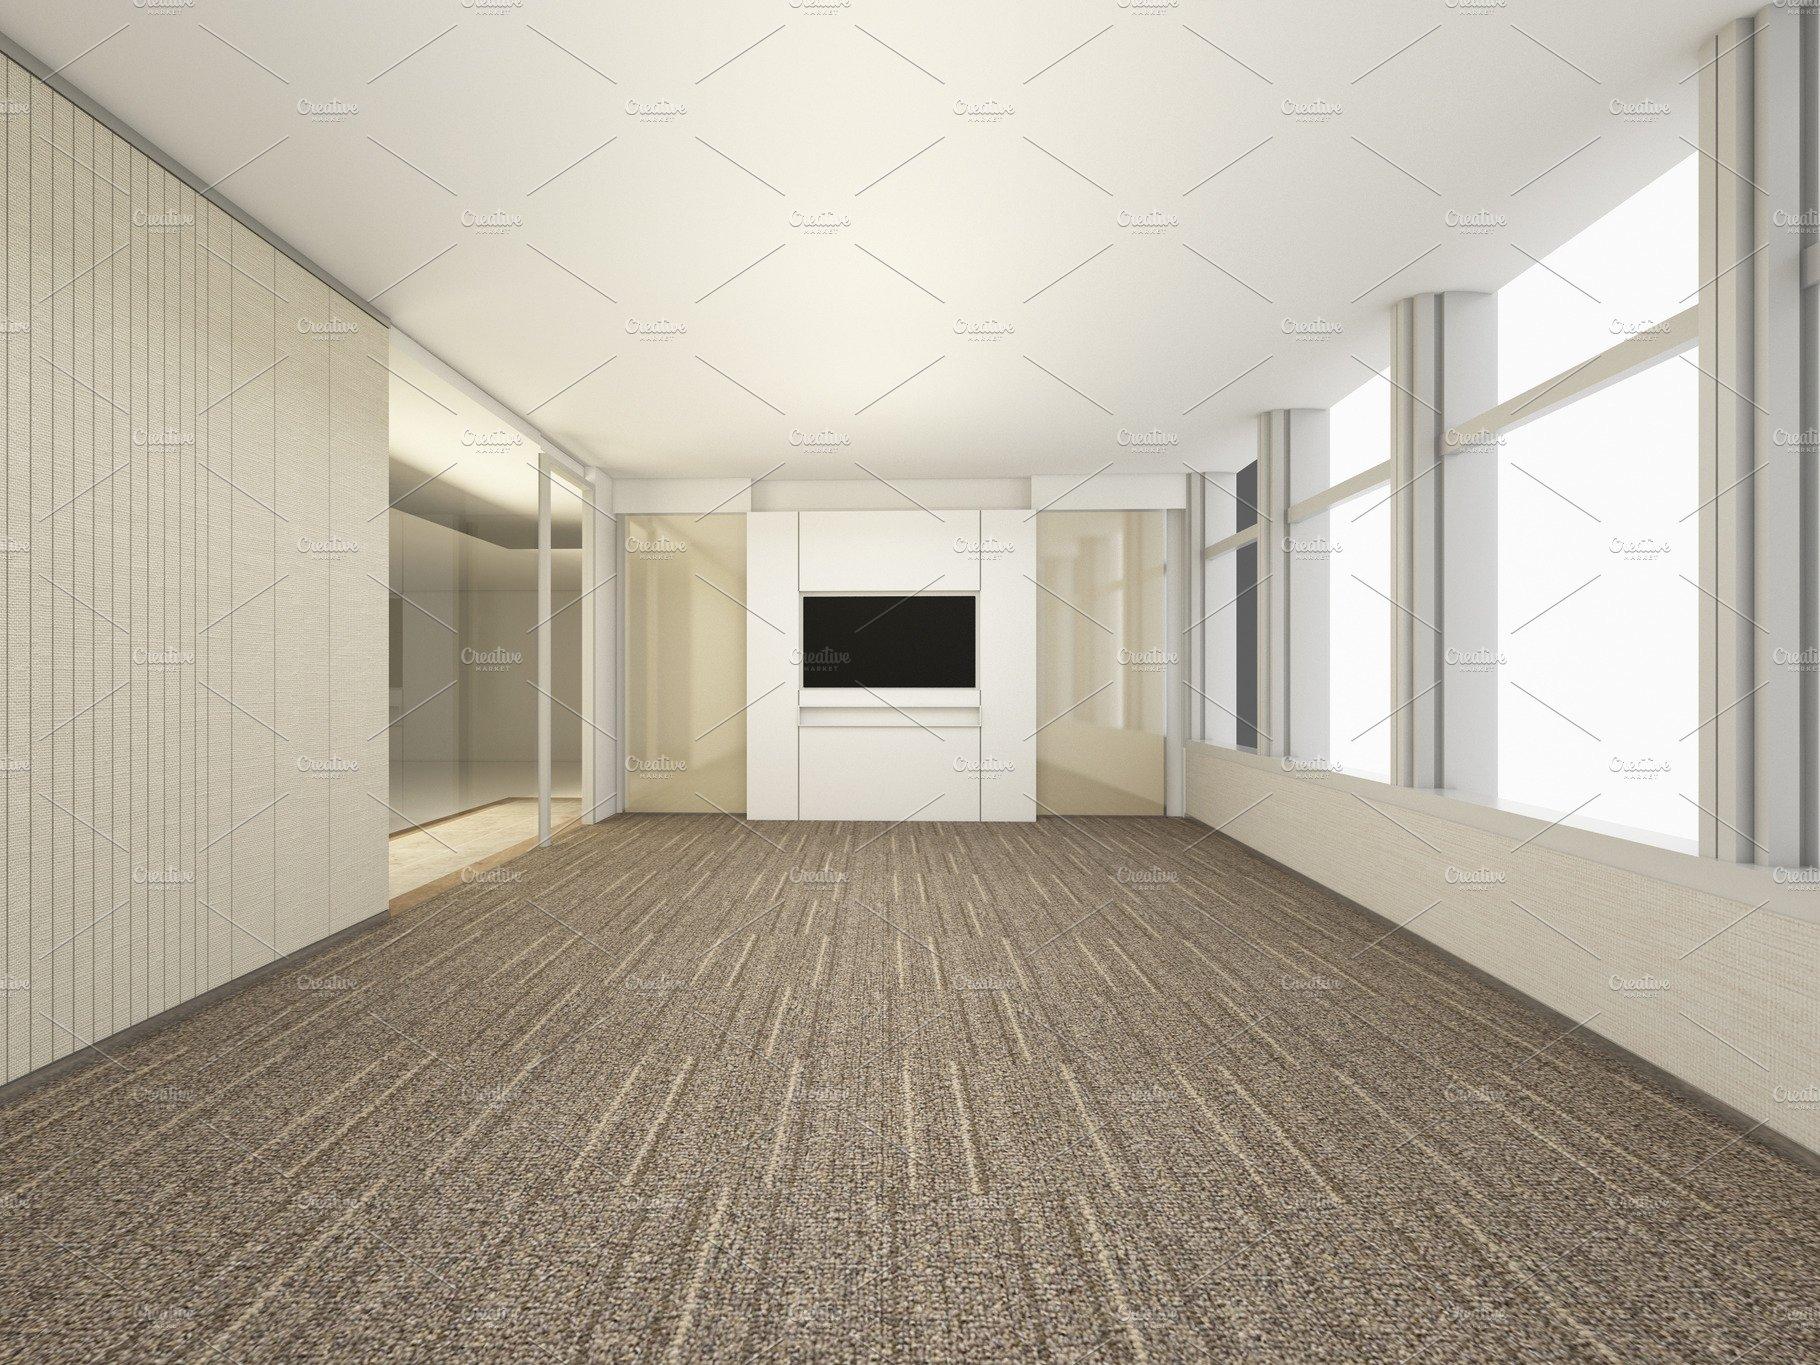 . Luxury White Empty room  3D Rendering Meeting Room  Interior design  illustration